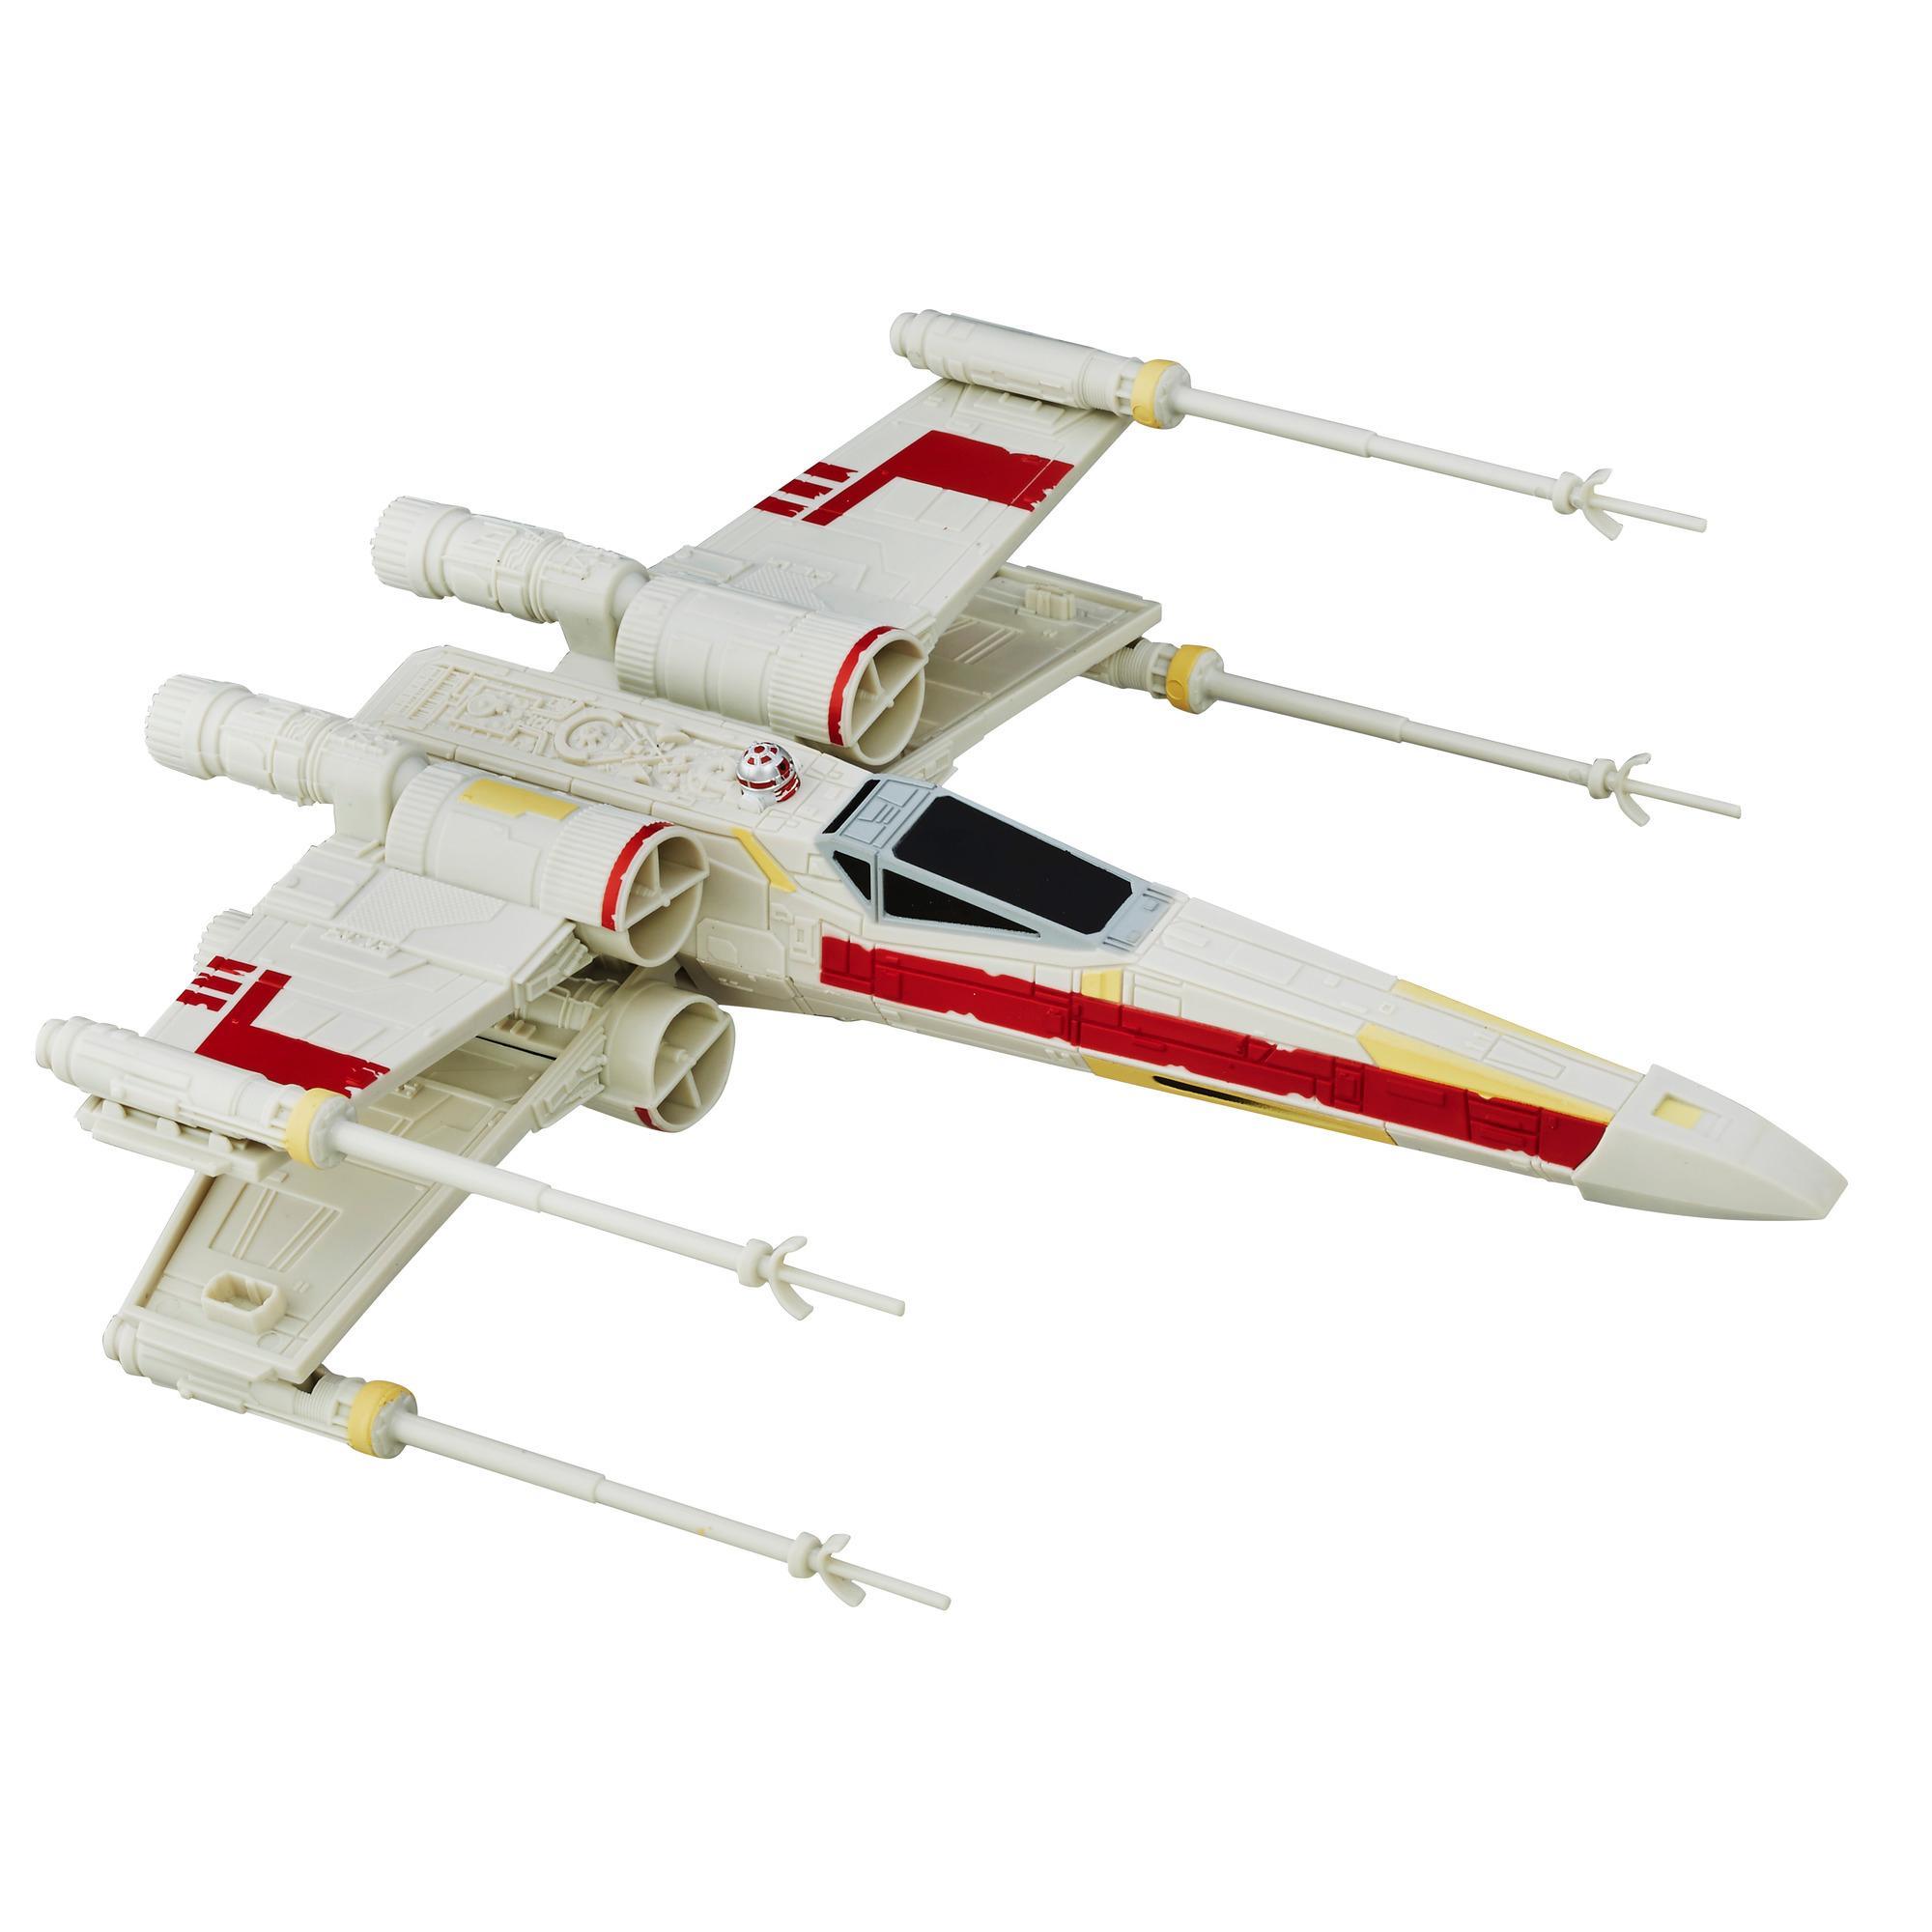 Star Wars R1 Xwing